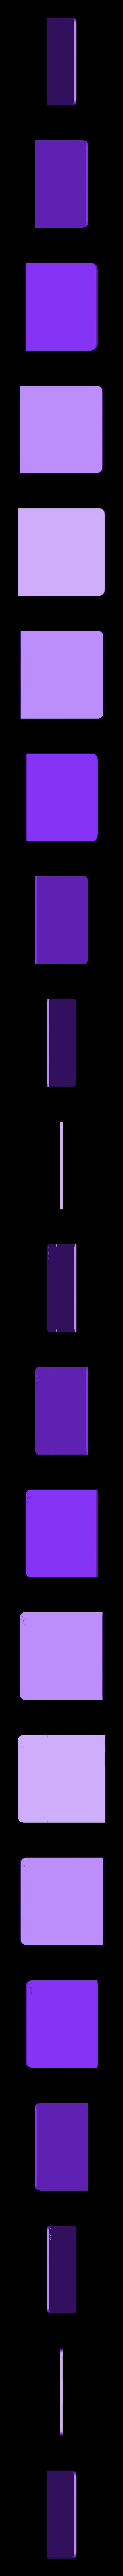 M4 fond.stl Download STL file Brush module c is accessory N ° 1 • Template to 3D print, prusai33